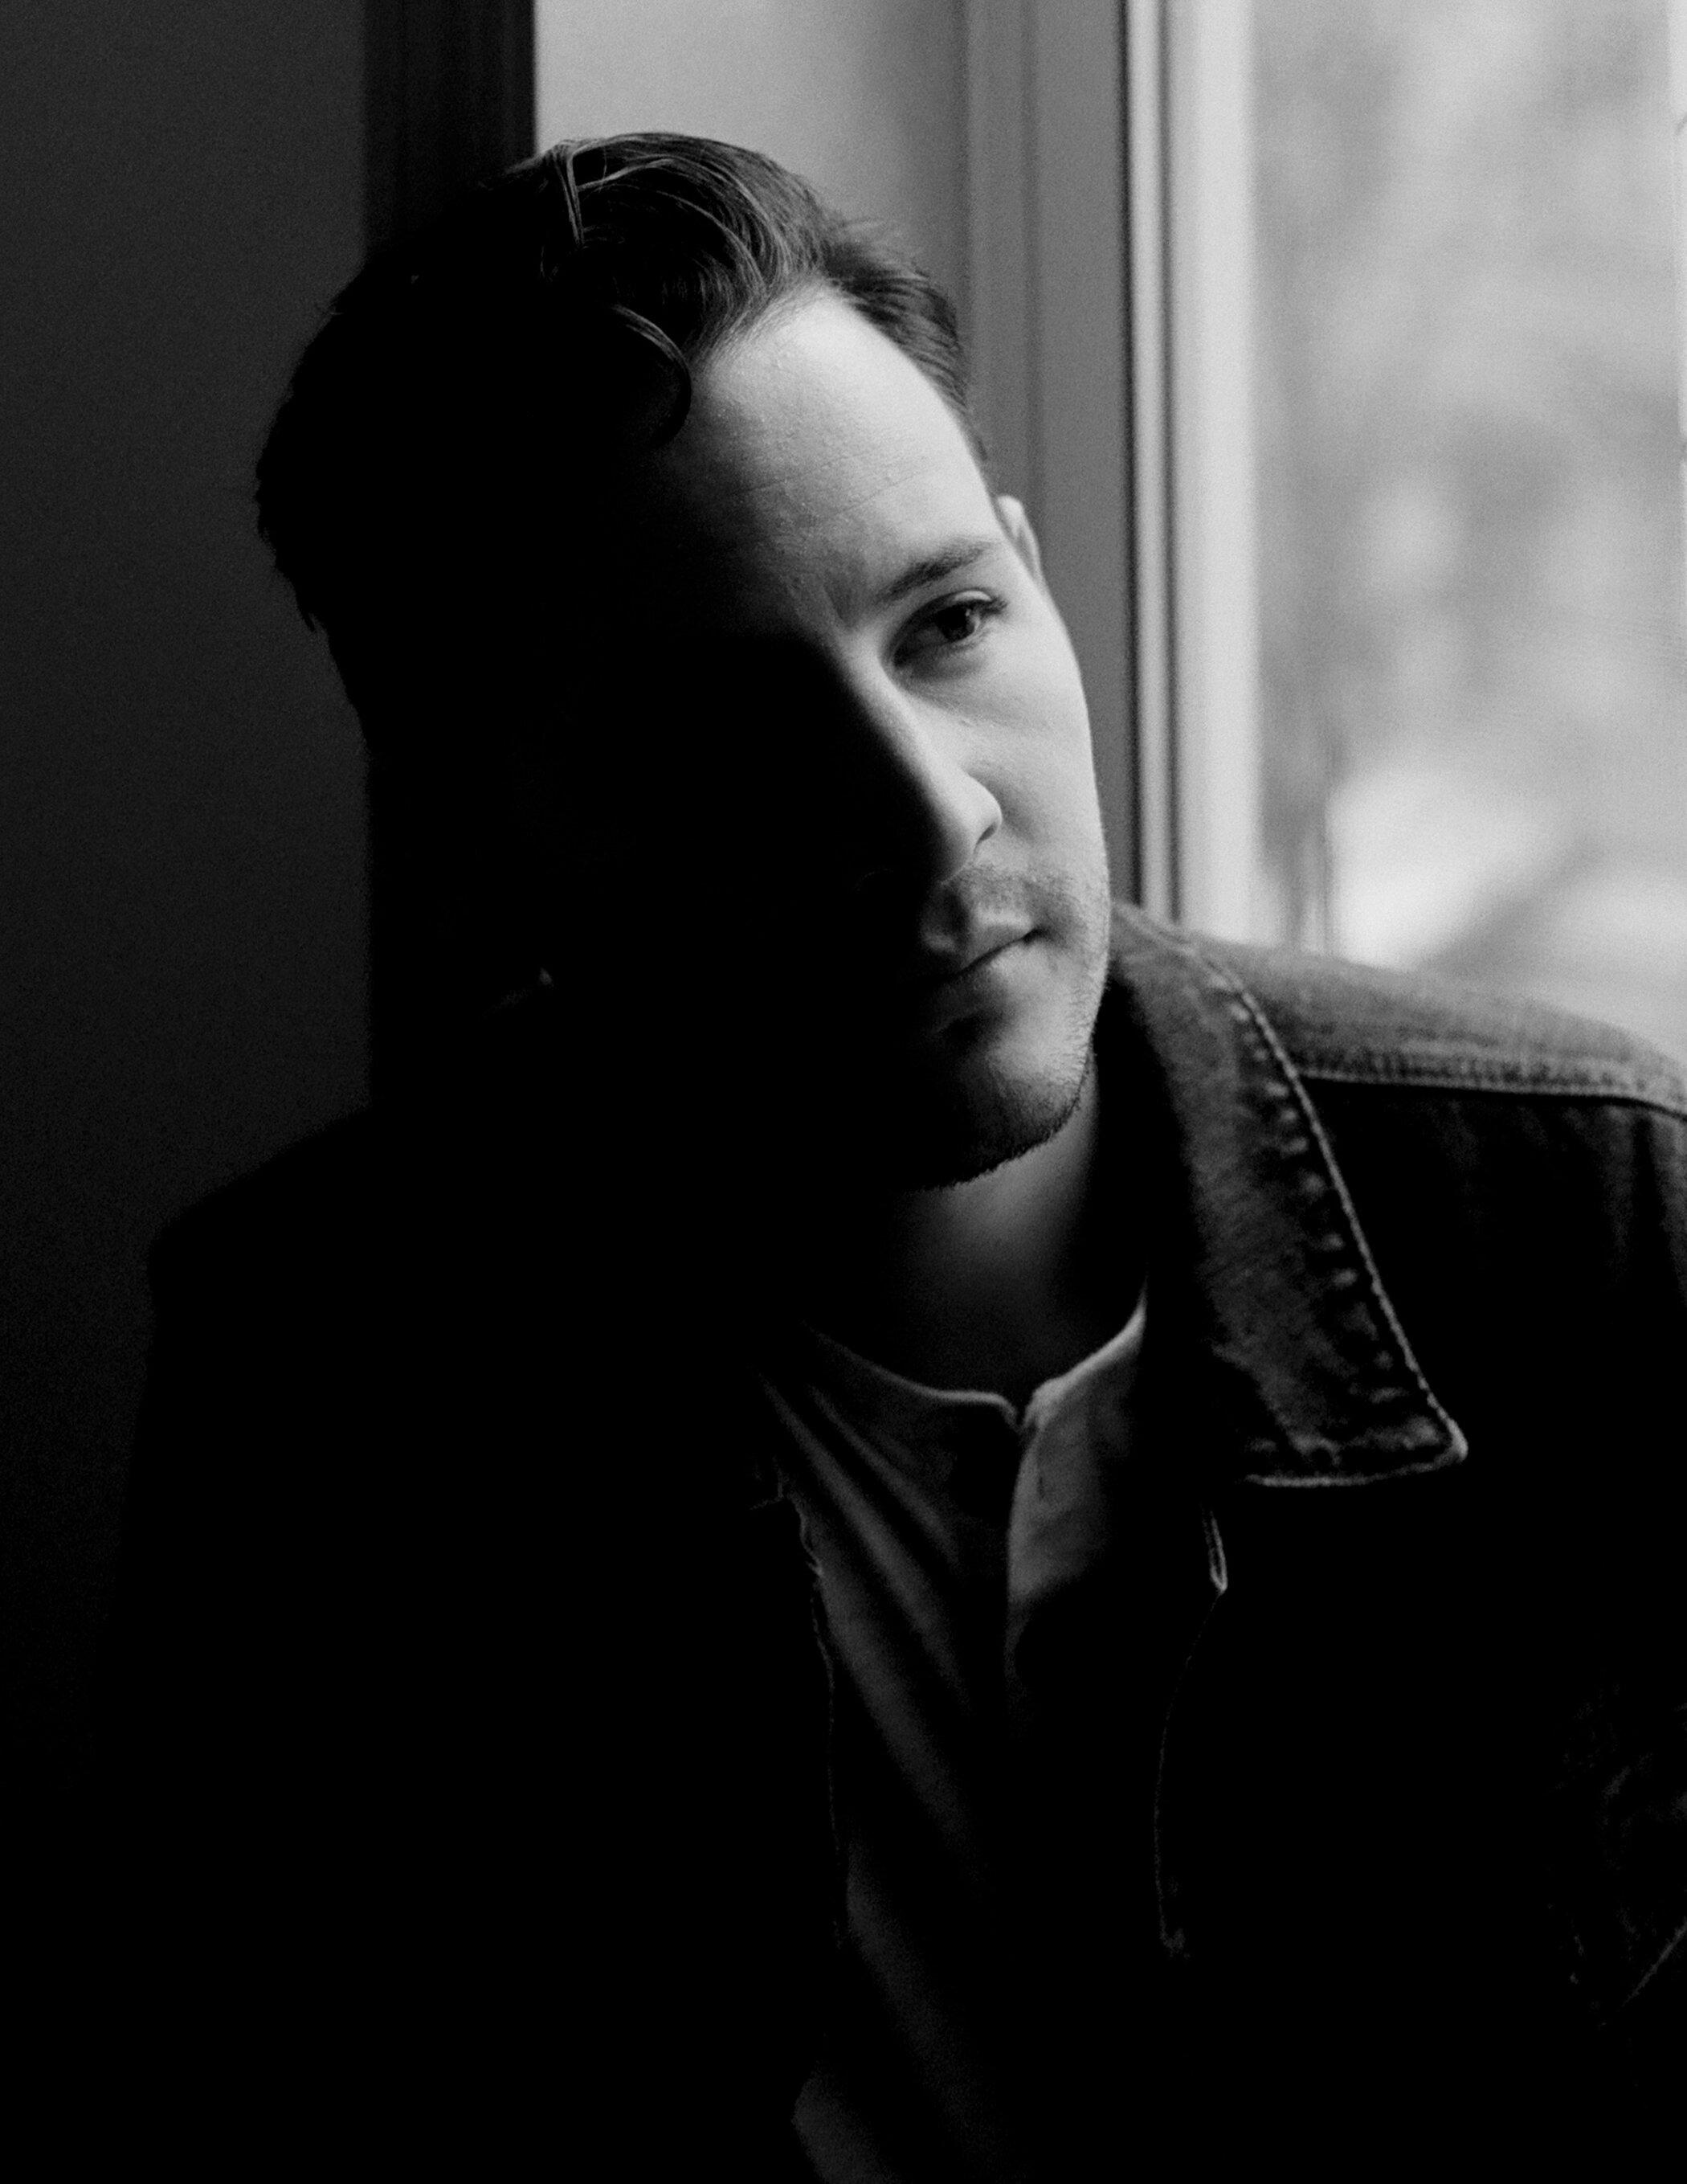 106-aaron-durall-nyc-portrait-photographer.jpg